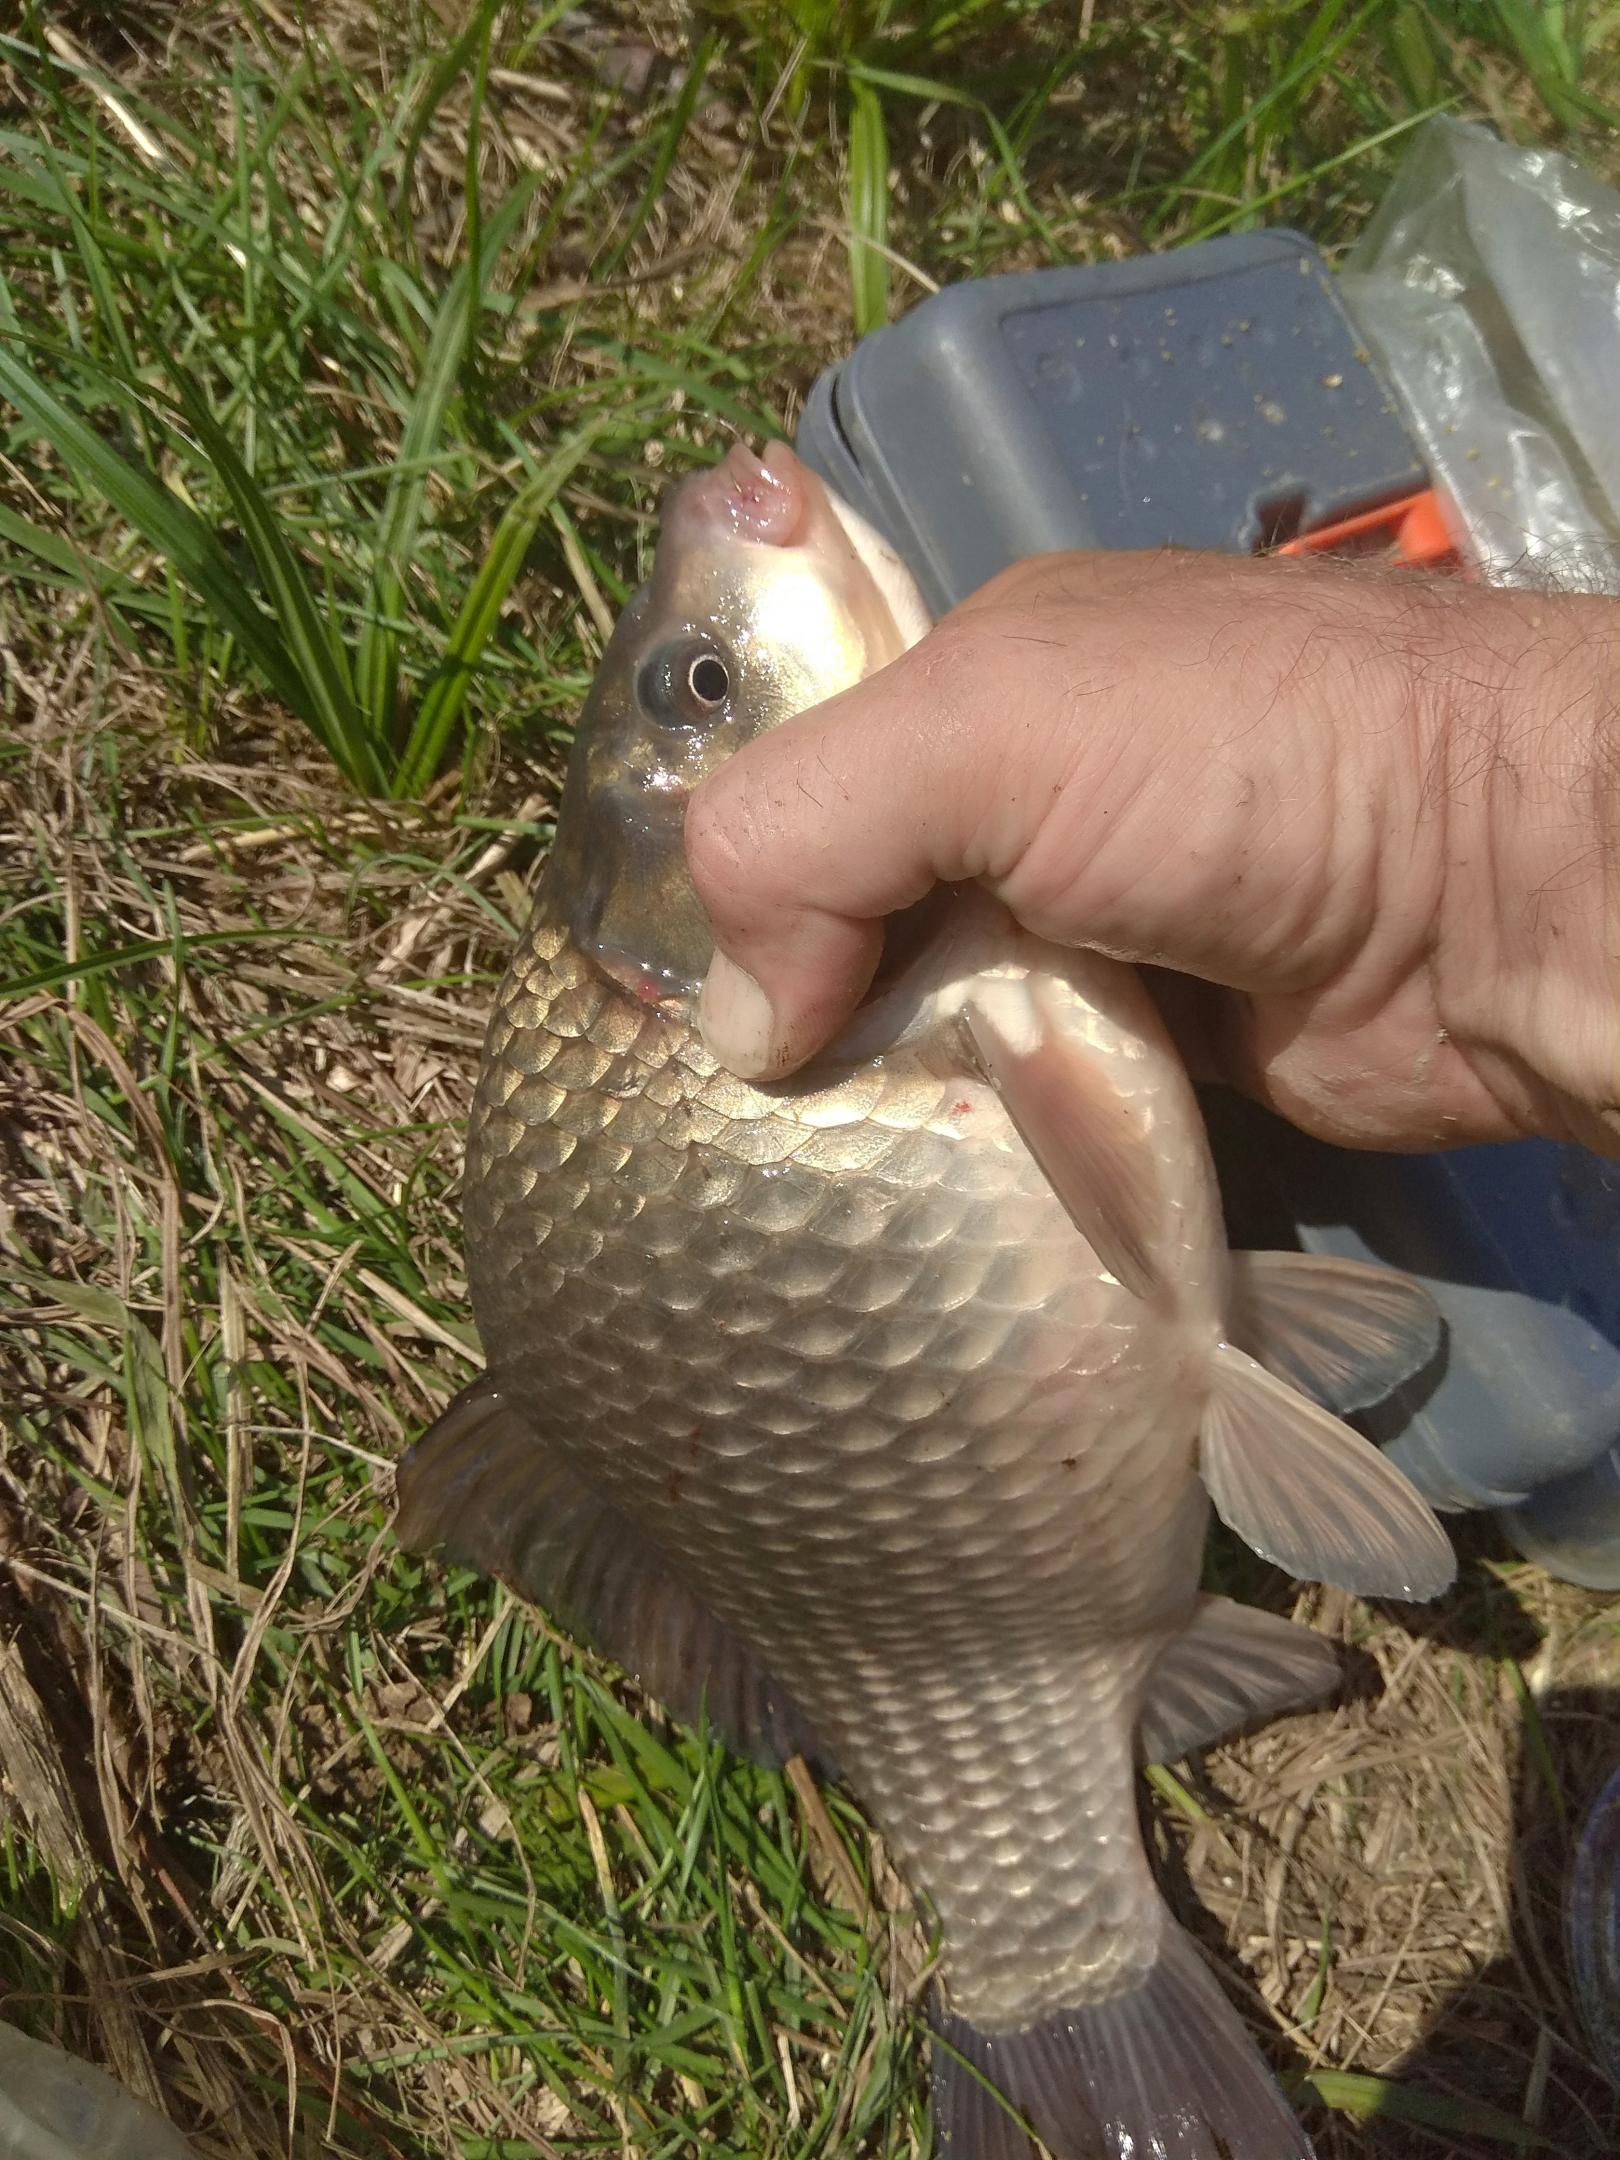 Вчера отметили на даче ДР жены, и пока ... | Отчеты о рыбалке в Беларуси